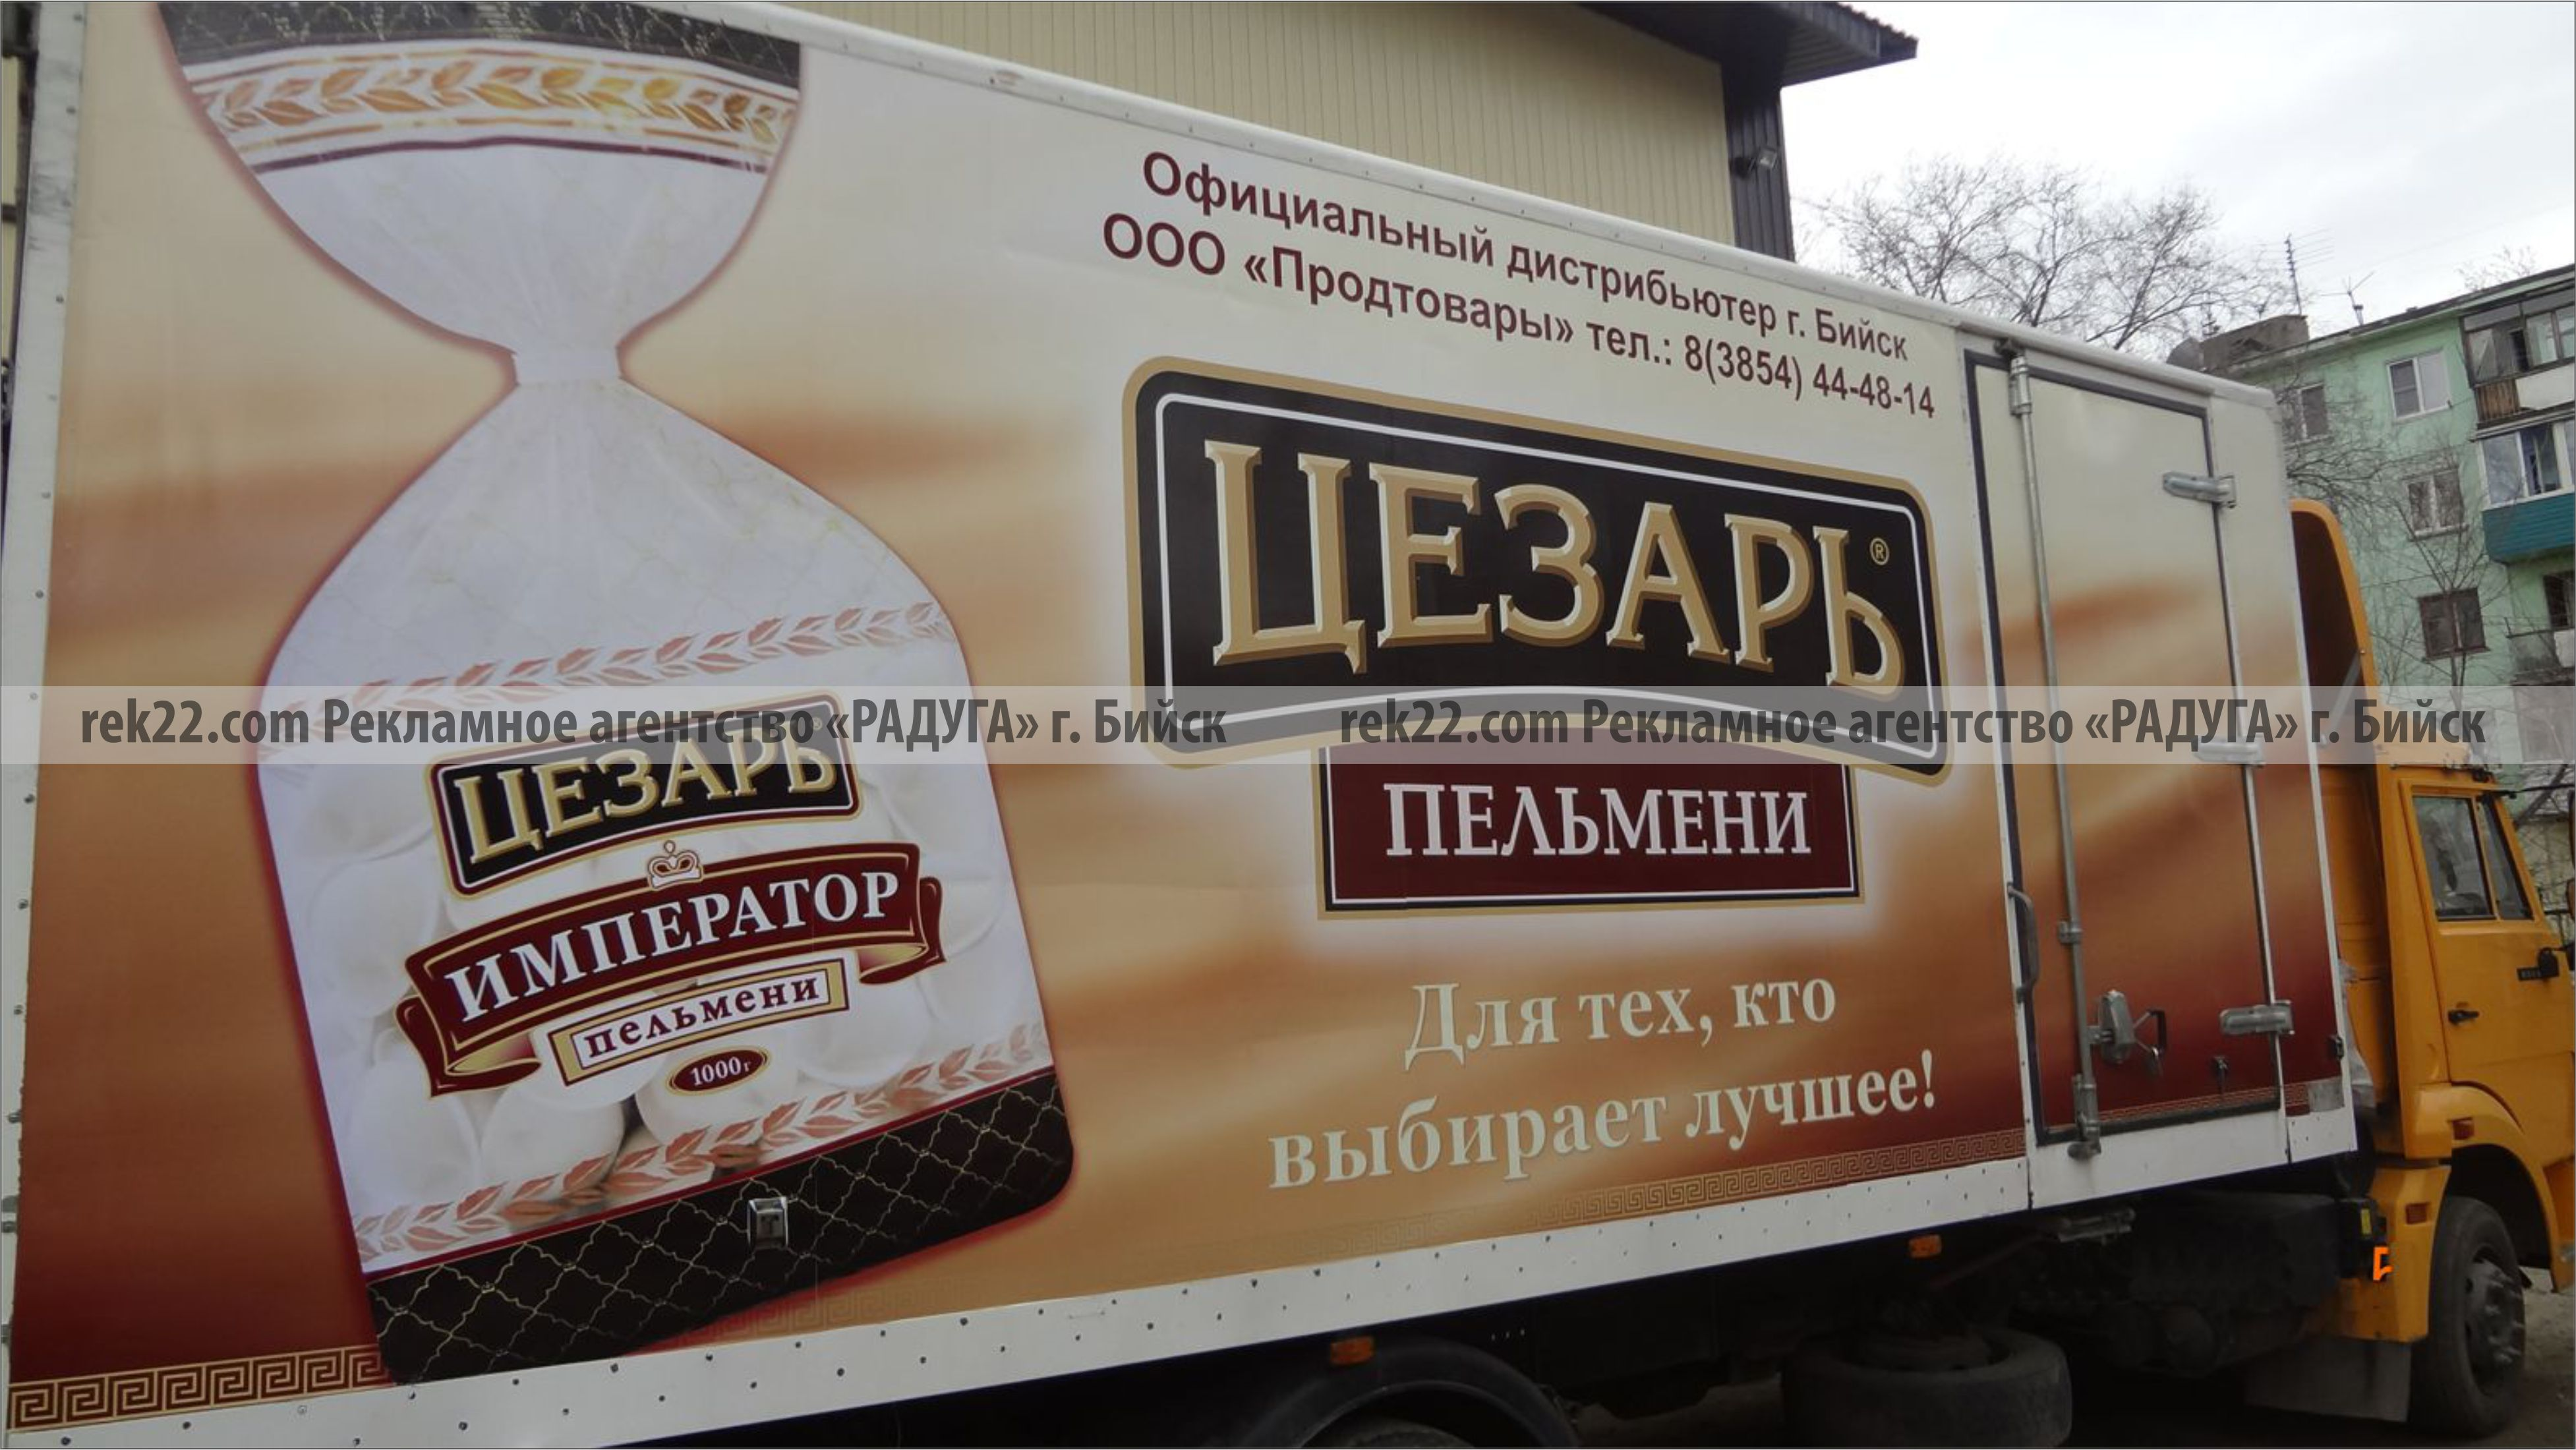 Реклама на транспорте Бийск - оклейка авто - 2